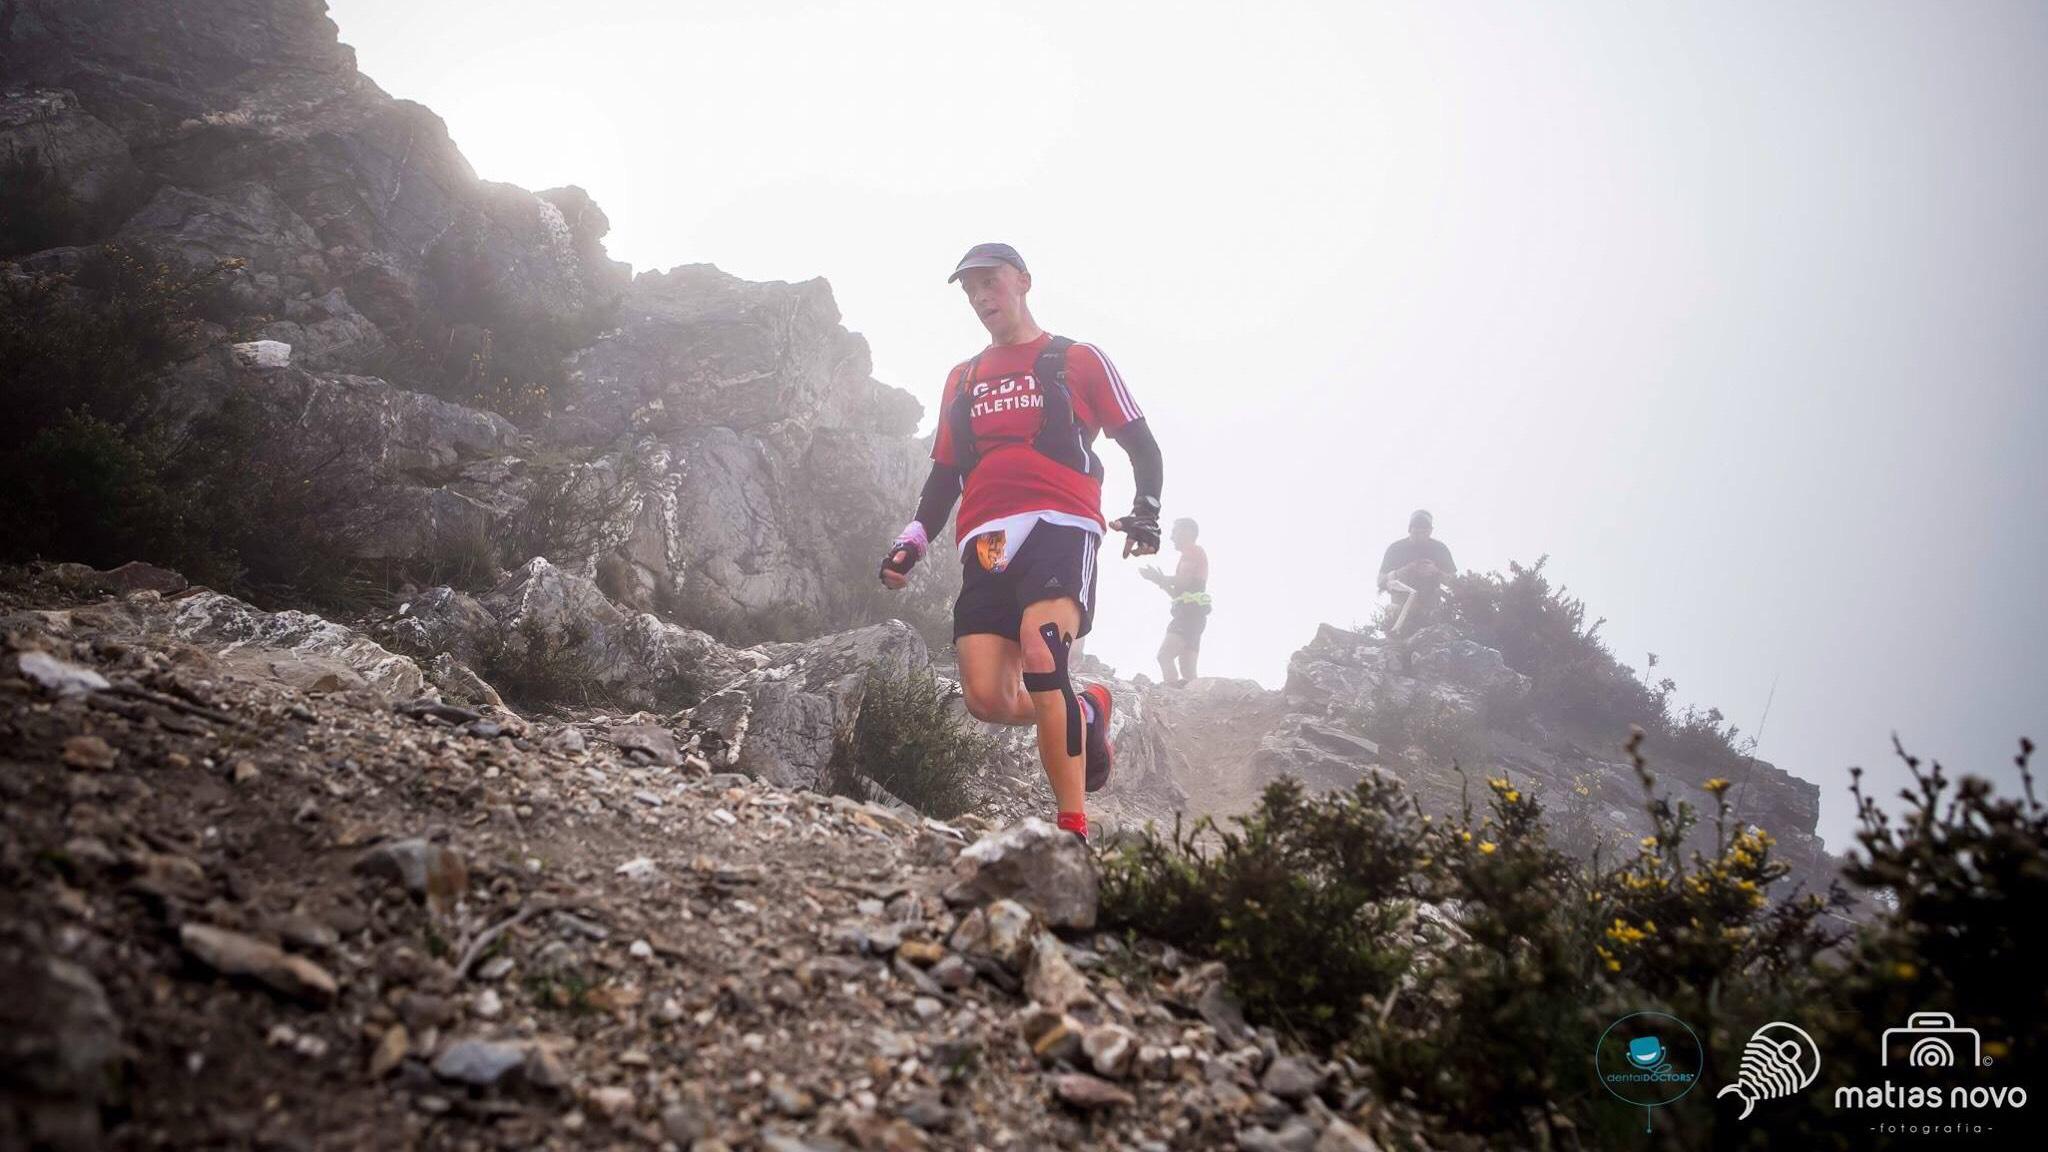 sedentário a ultramaratonista